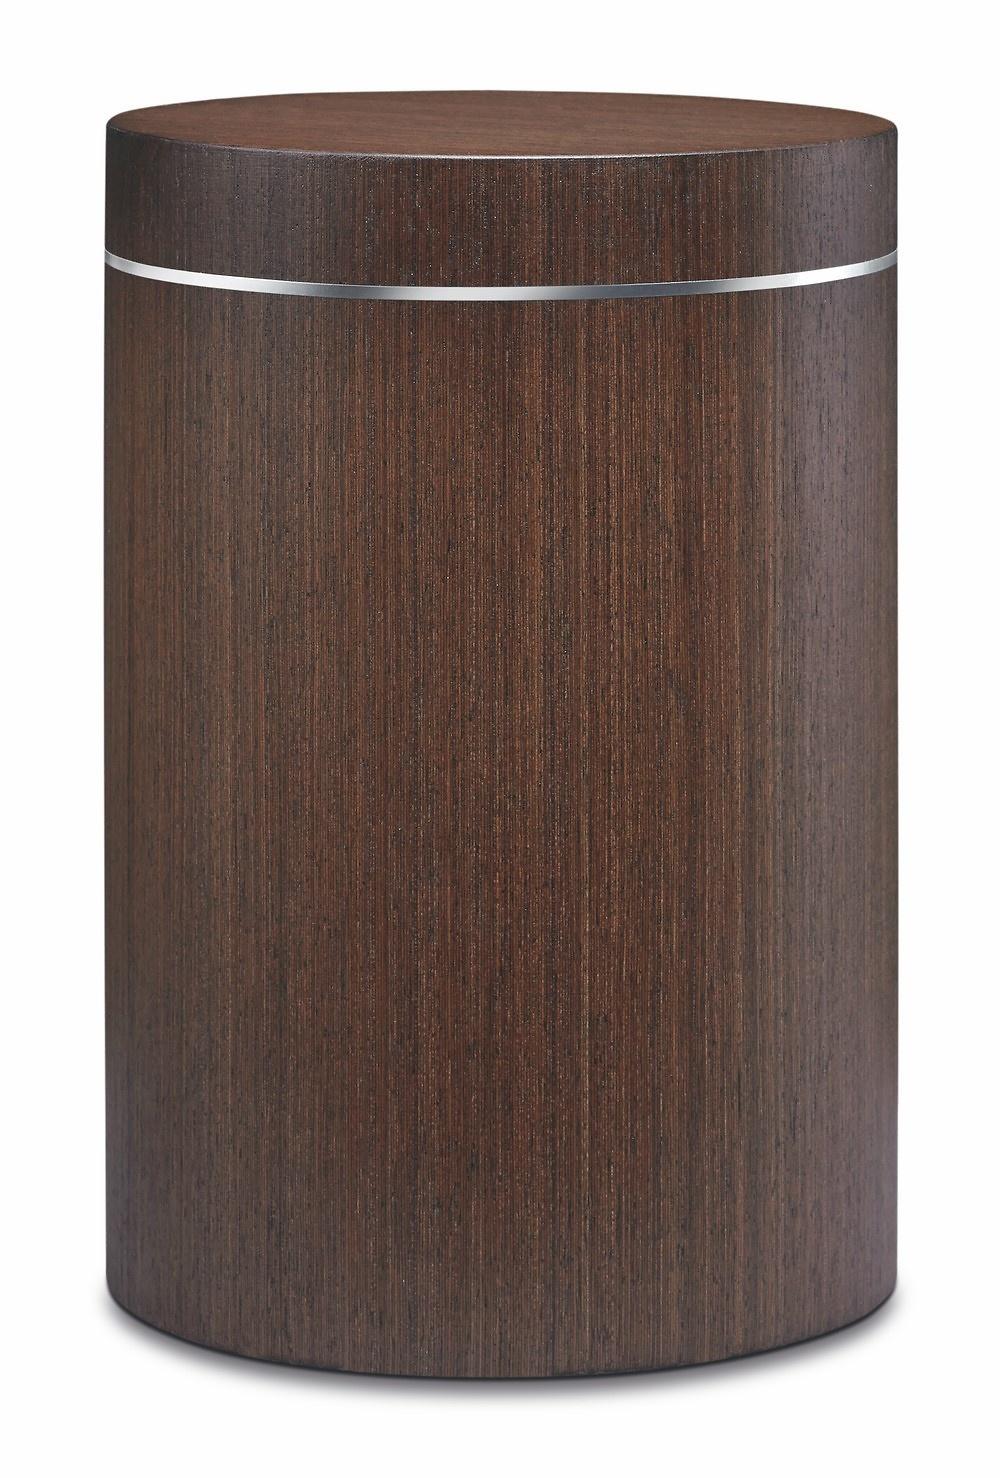 Urna de Madera cilindro